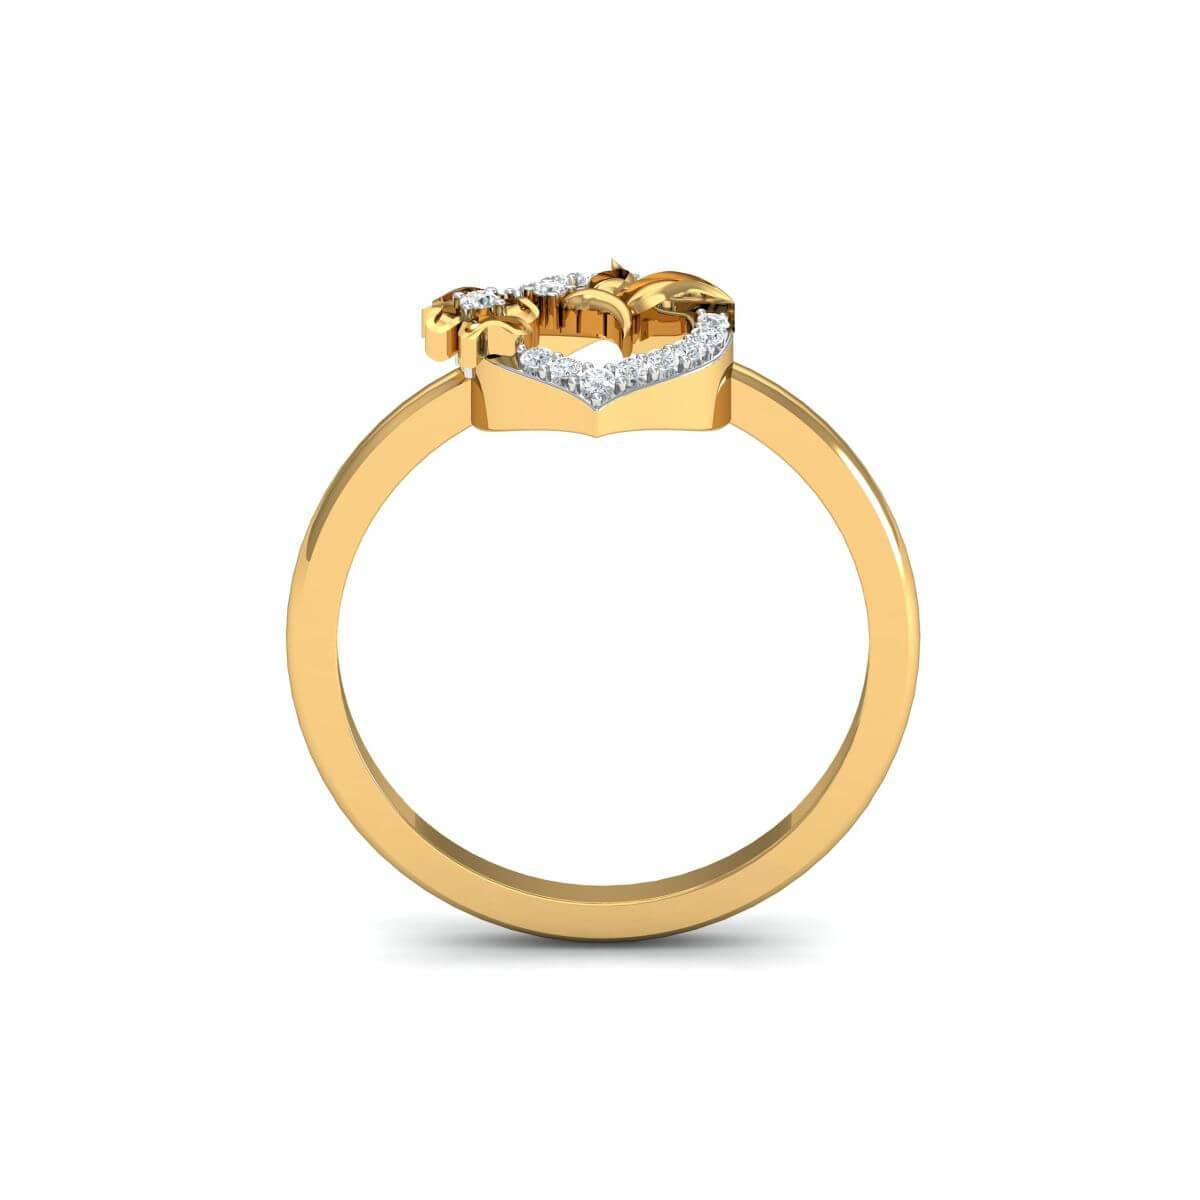 Diamoire Jewels 18kt Yellow Gold Pave 0.10ct Diamond Infinity Ring - UK G 1/4 - US 3 1/2 - EU 45 3/4 ybogk